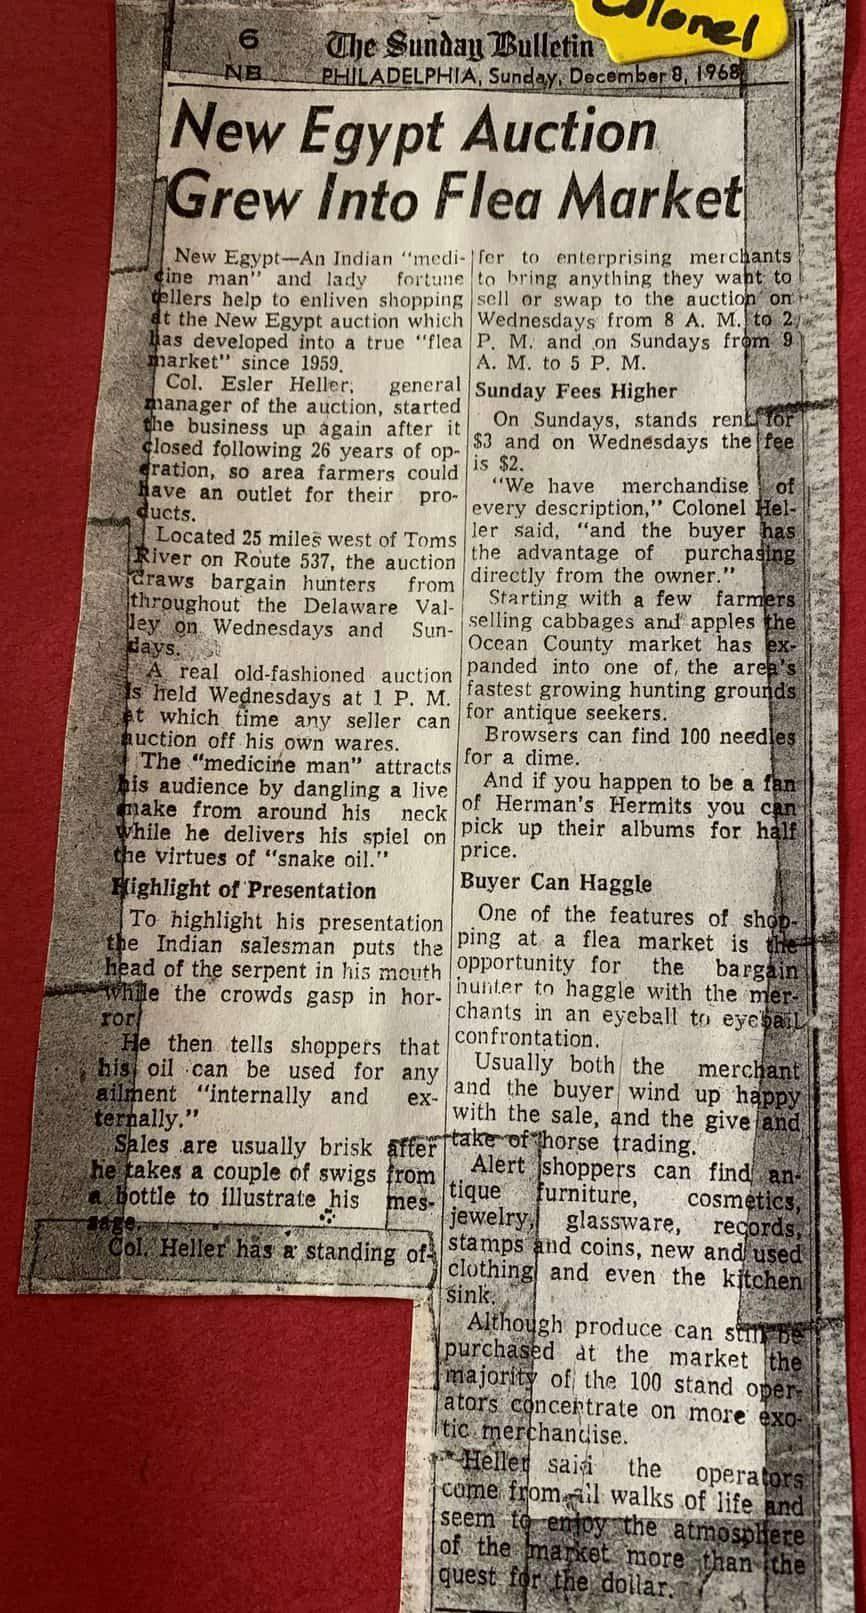 The Sunday Bulletin, Phila., PA: 12/8/1968- New Egypt Auction Grew Into Flea Market